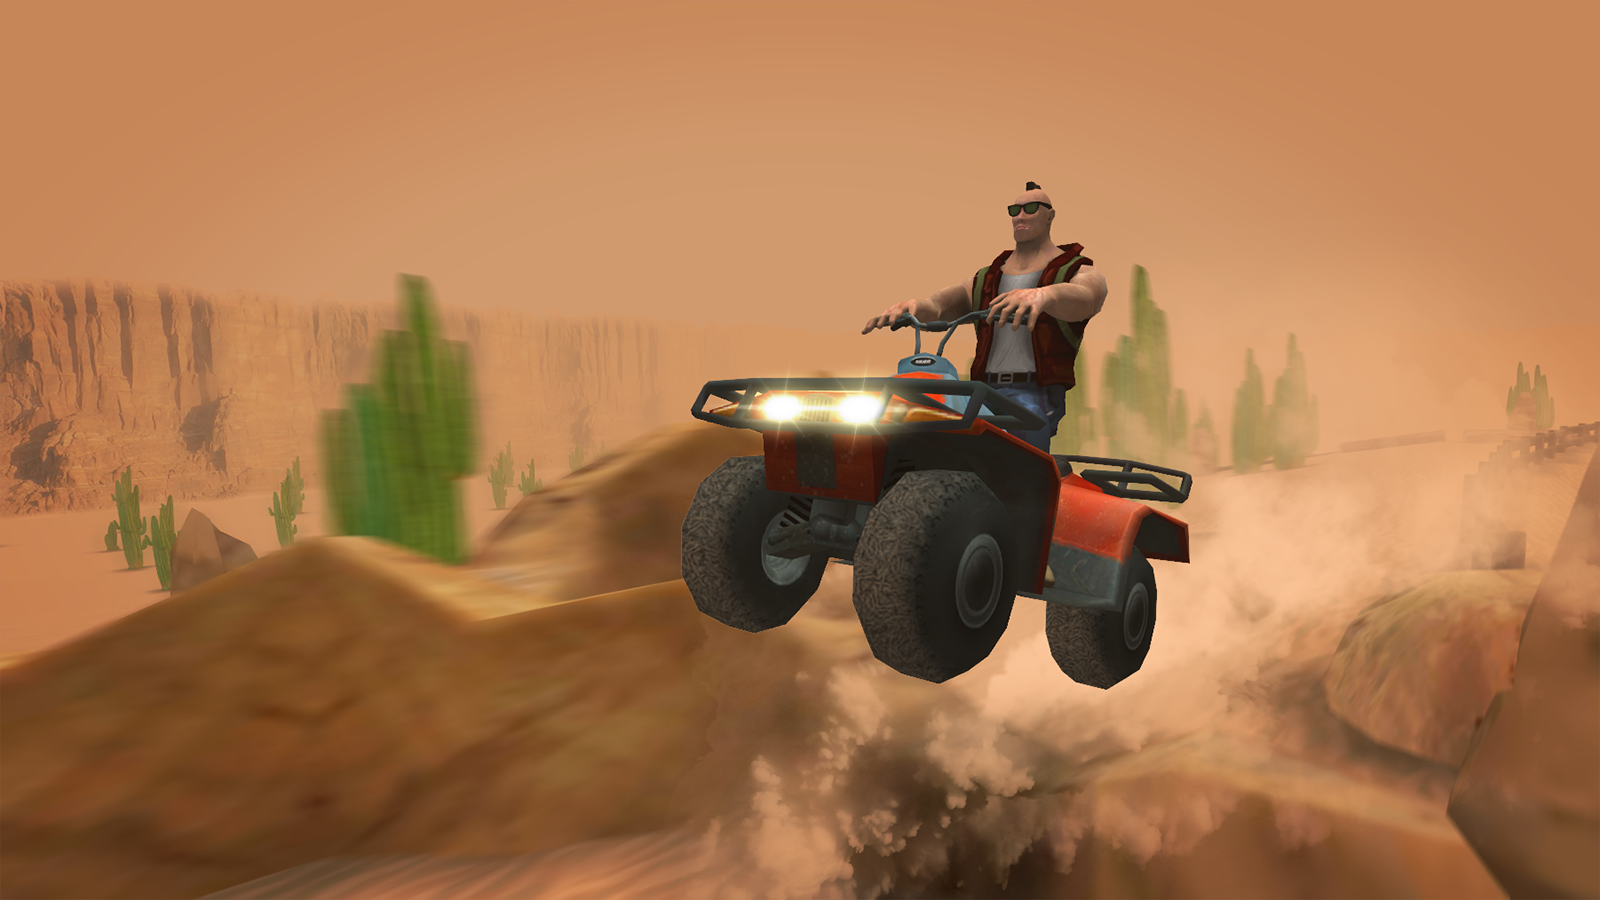 4x4-OffRoad-Desert-ATV 16